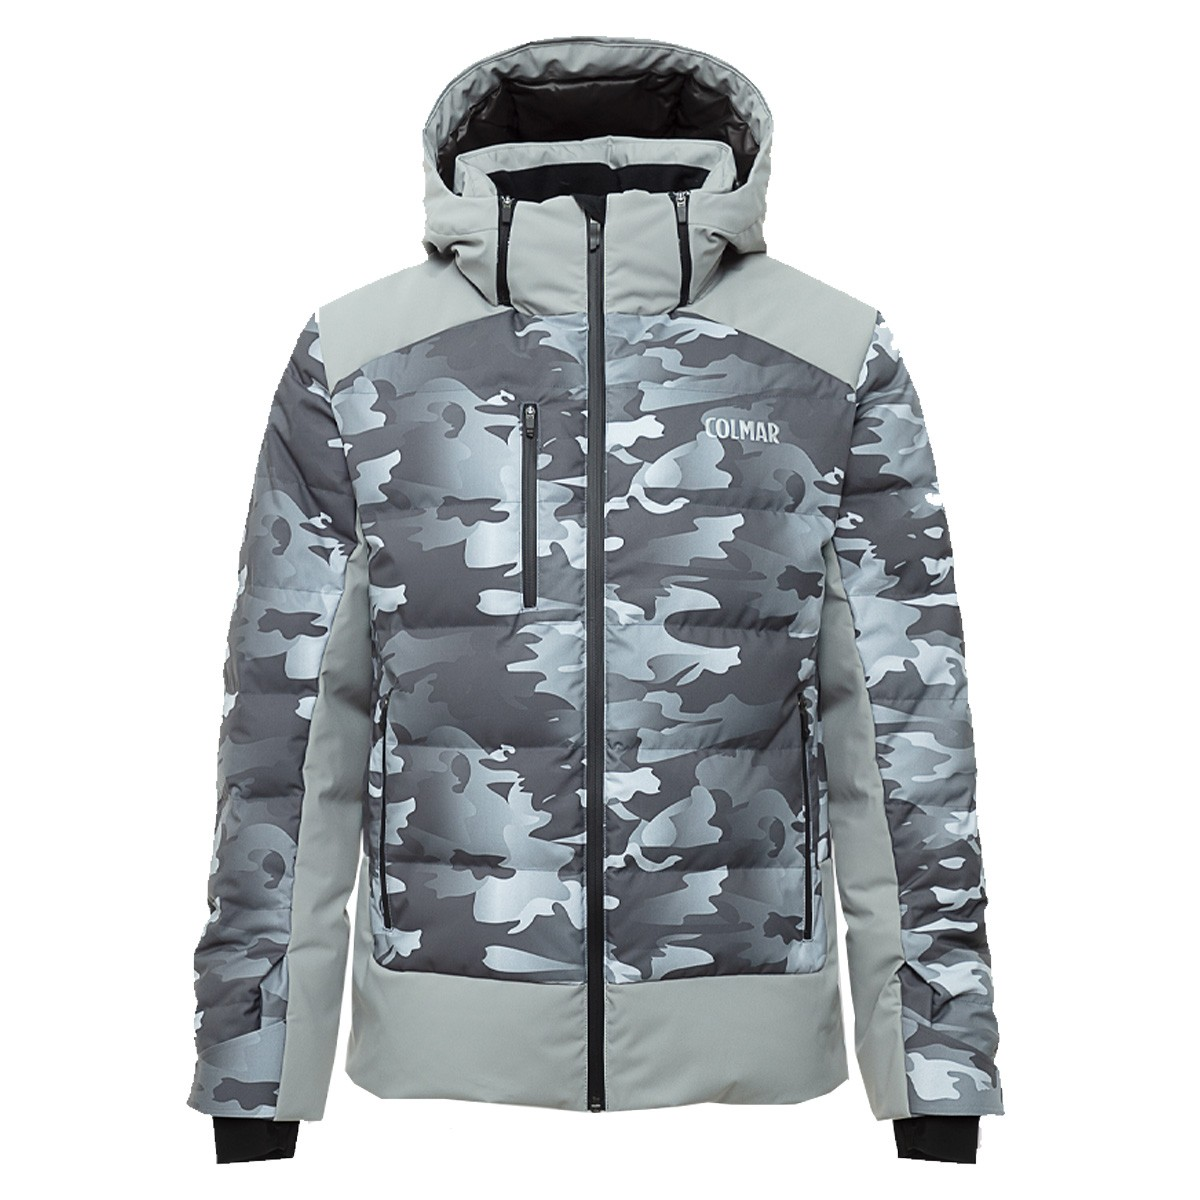 0c01a7c0 most popular ski jacket colmar chamonix man grey